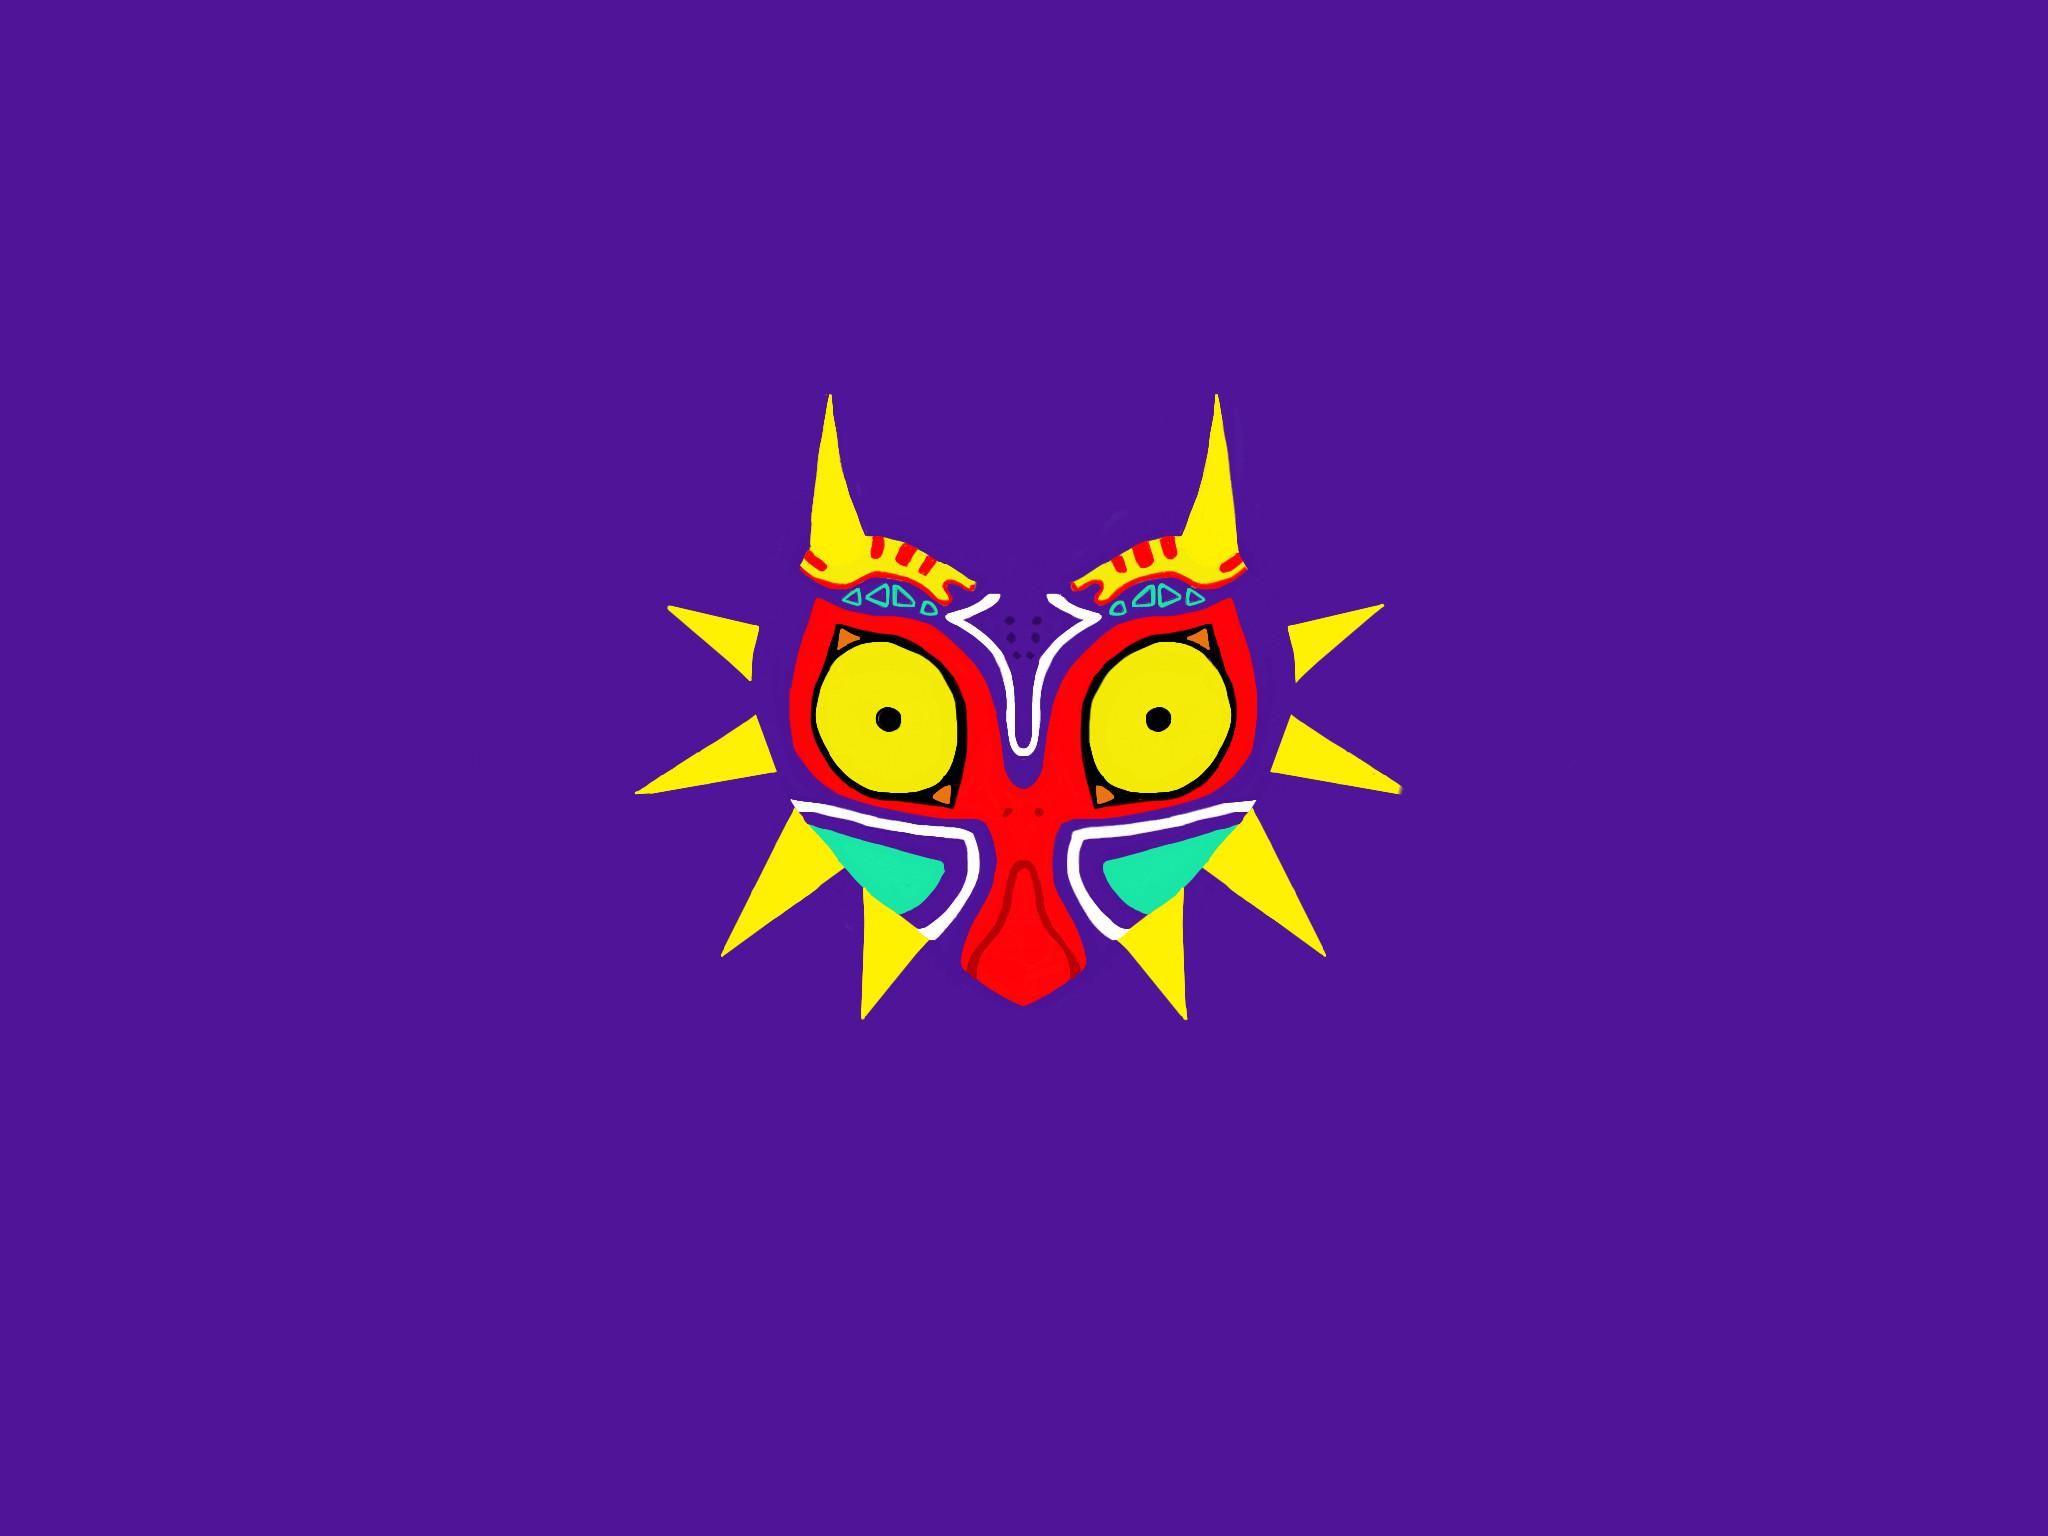 … Majora's Mask [Wallpaper] by theKuroKitsune